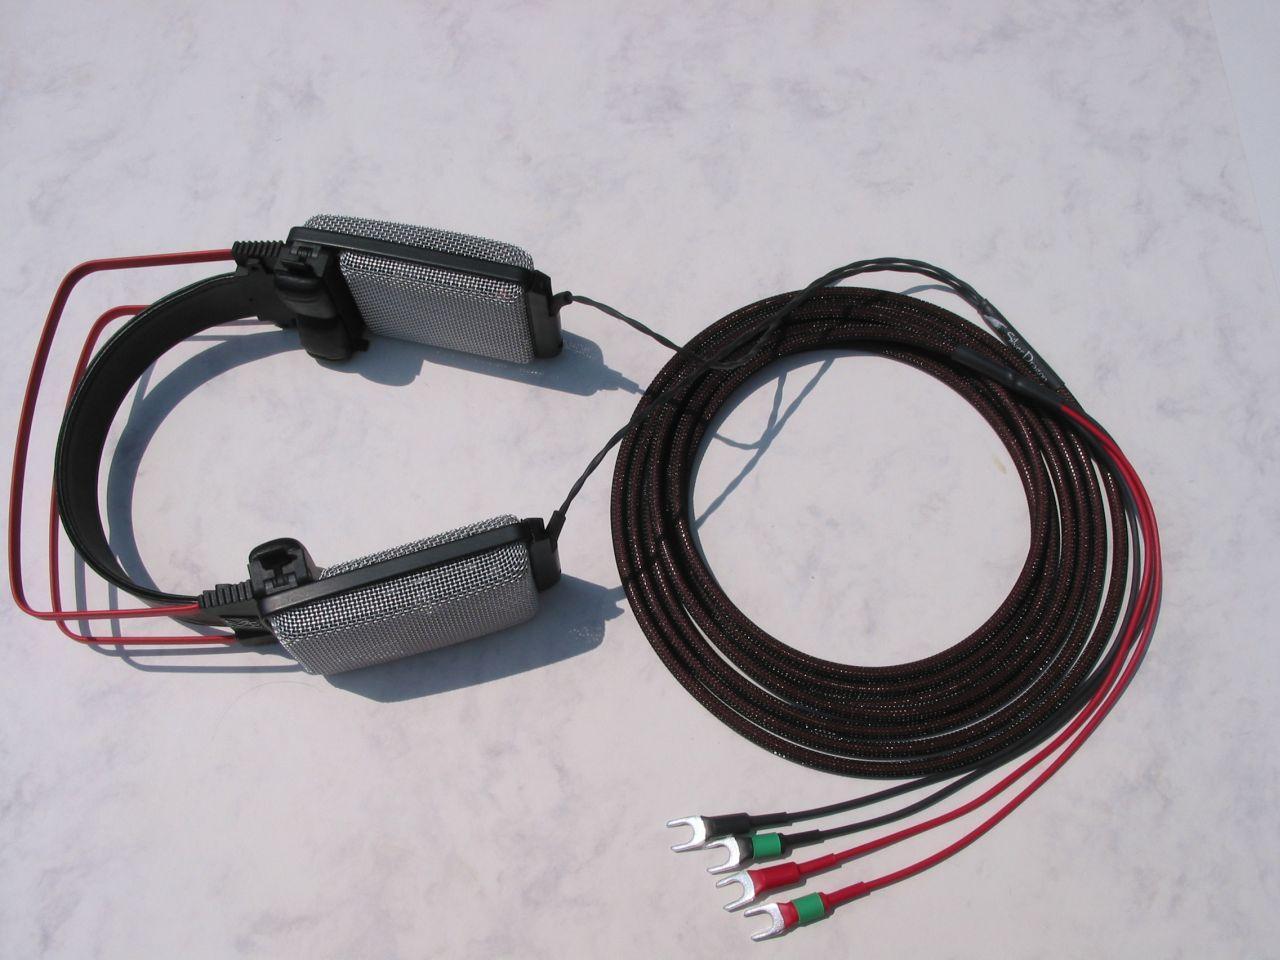 AKG K1000 Silver Dragon V2 W/ Spades Headphone Cable